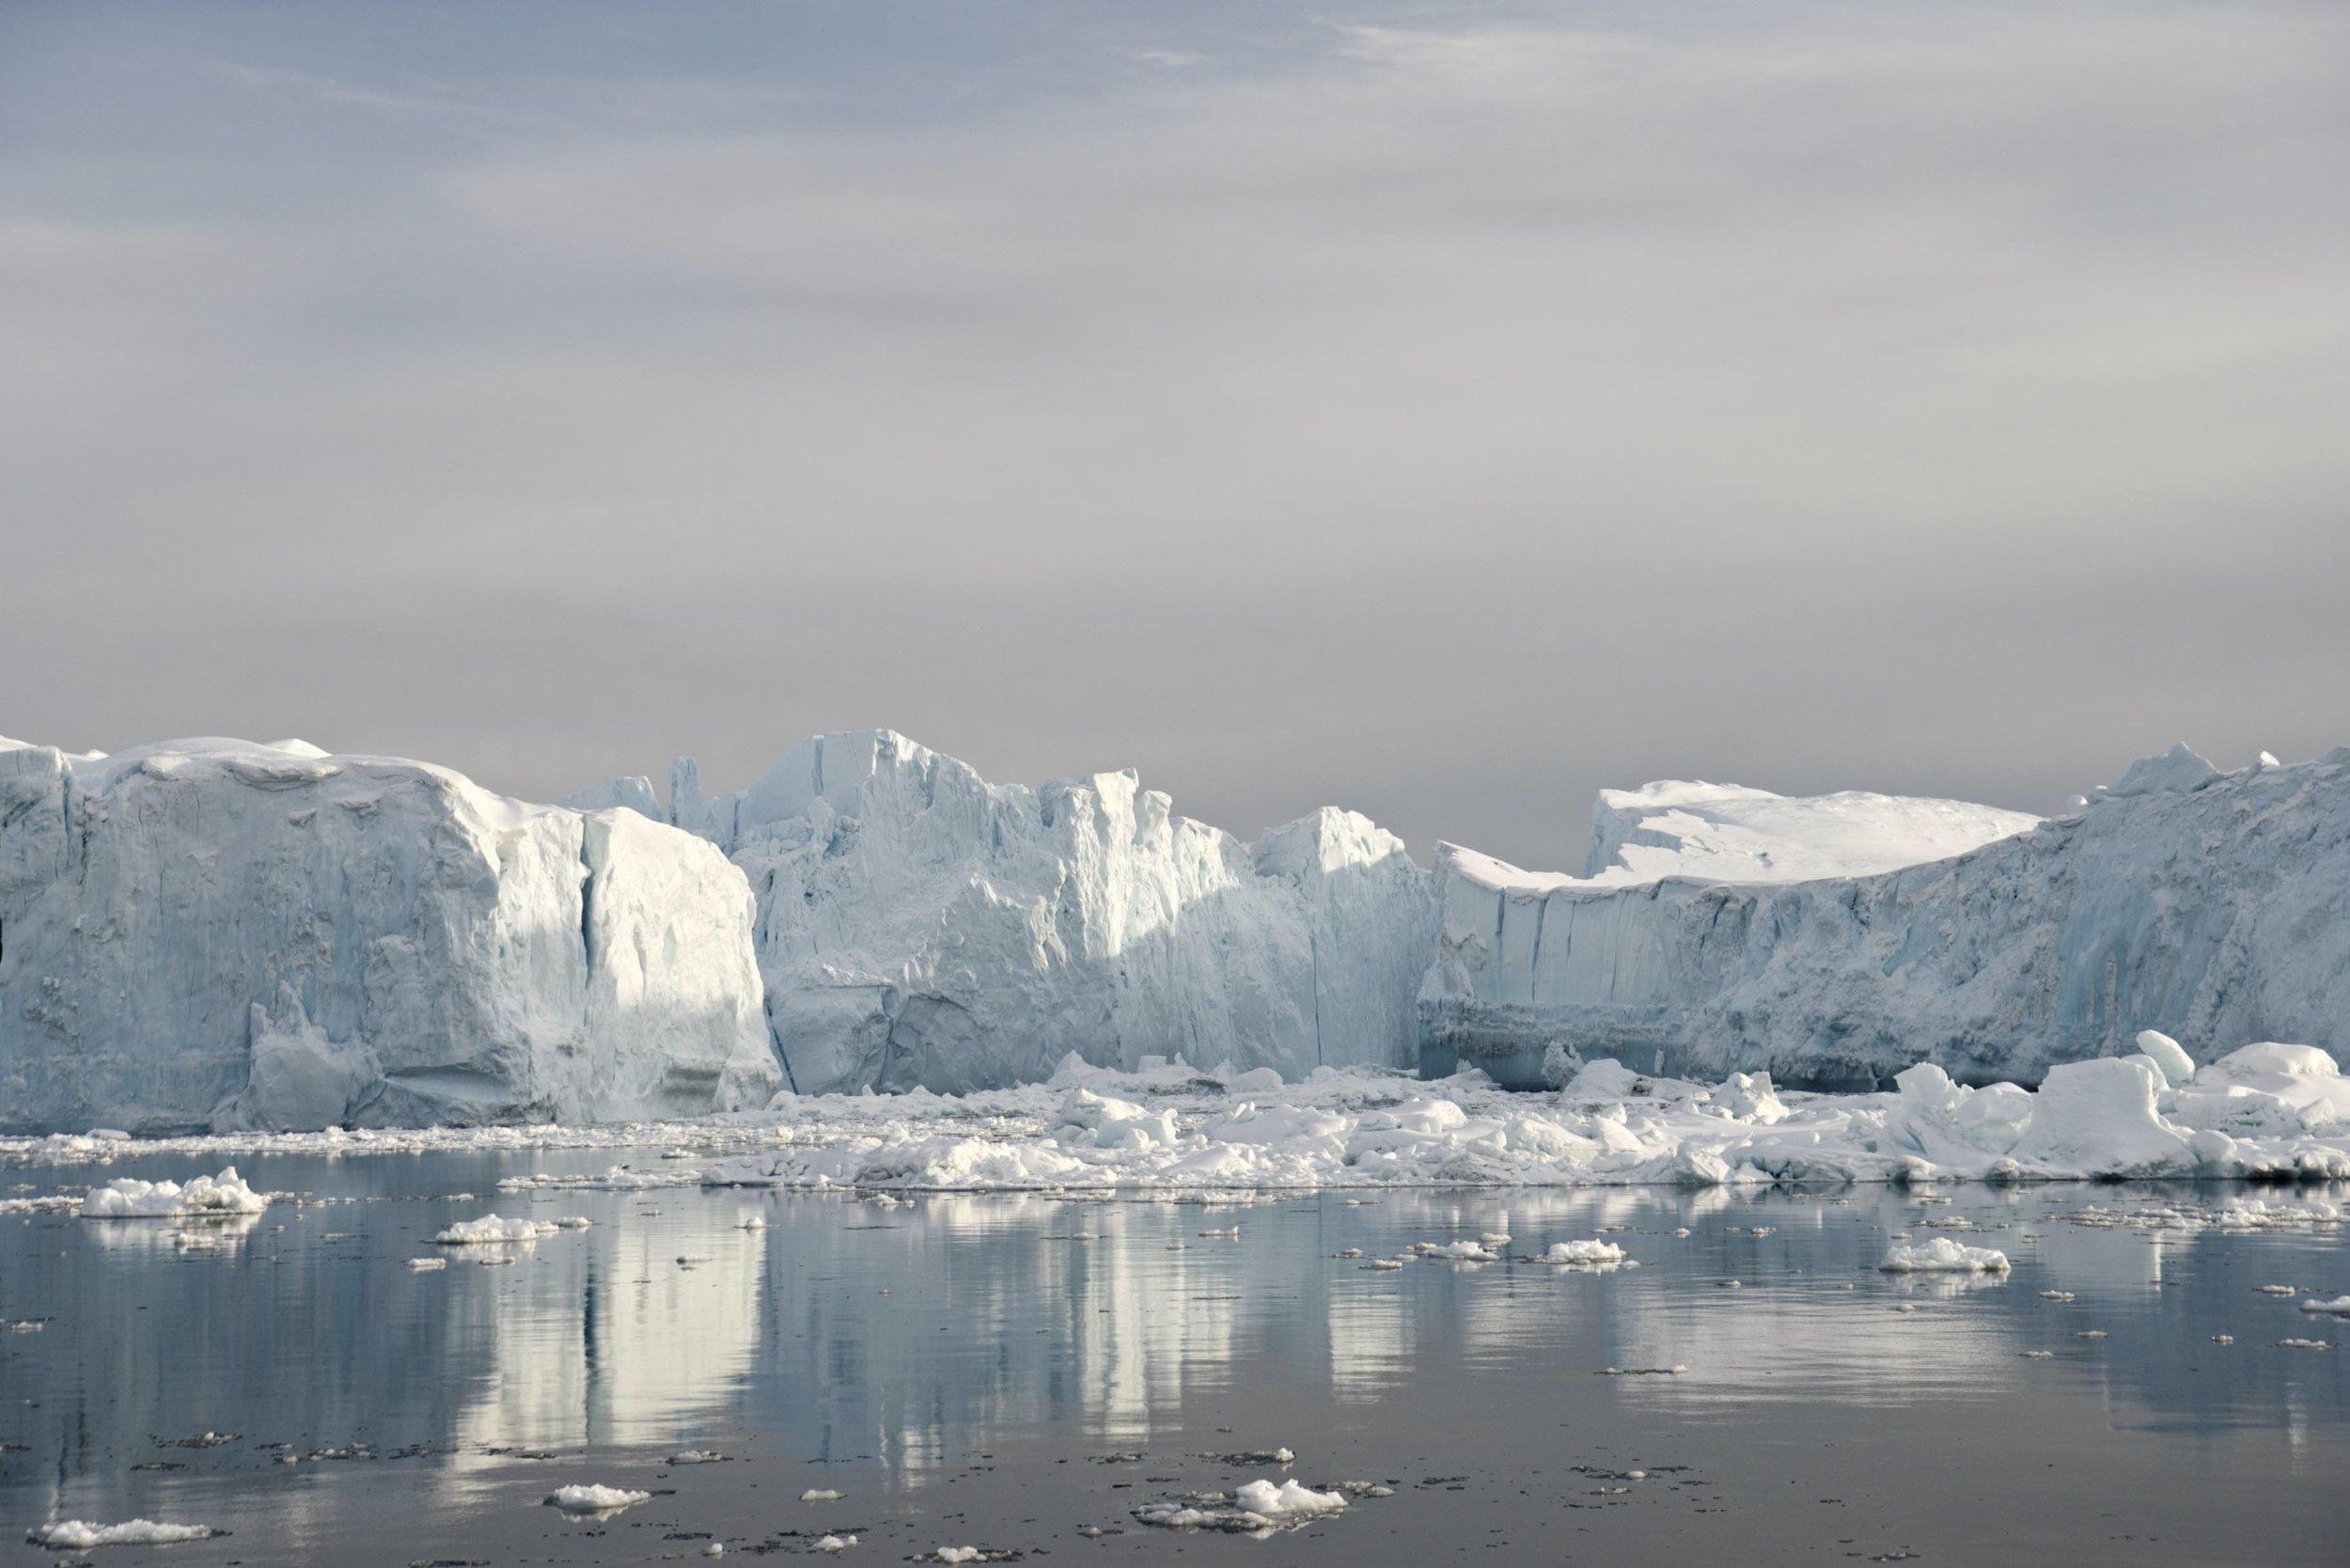 Disko Bay, Greenland, 2017